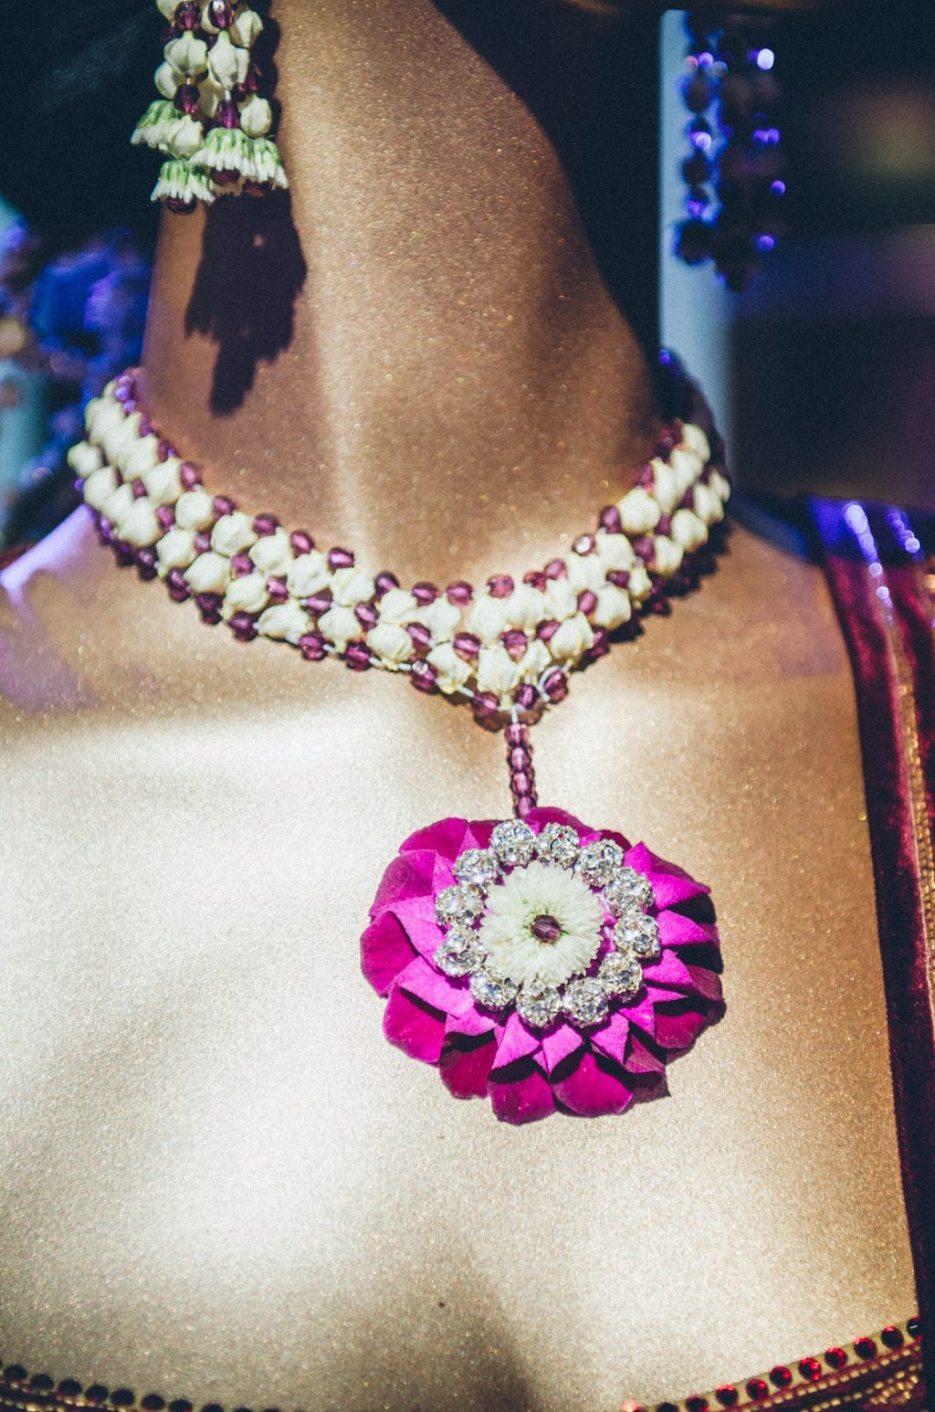 Tarun-Tahiliani-Bridal-Couture-Wedding-Wear-Fashion-Designer-Photographer-Naina-Knottytales-31.jpg